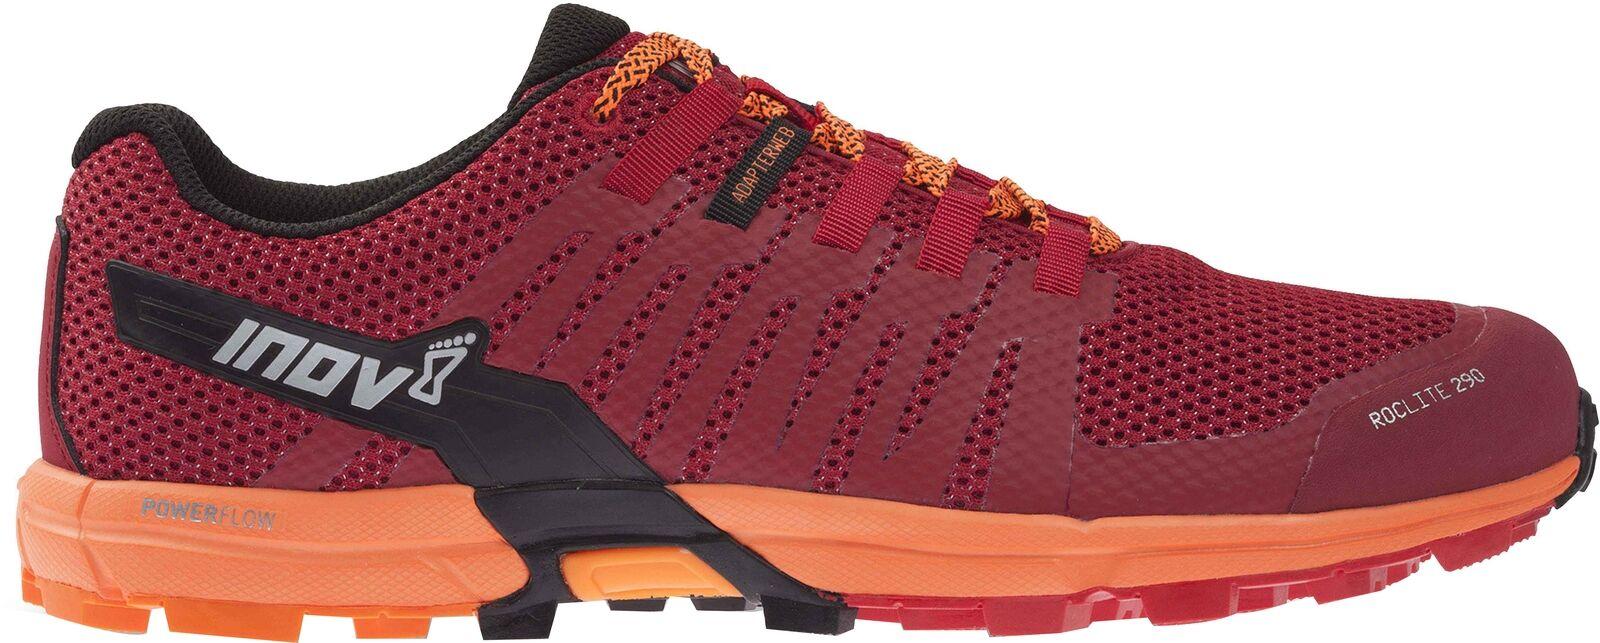 Inov 8 Roclite 290 Hombre Trail Running Zapatos-Rojo